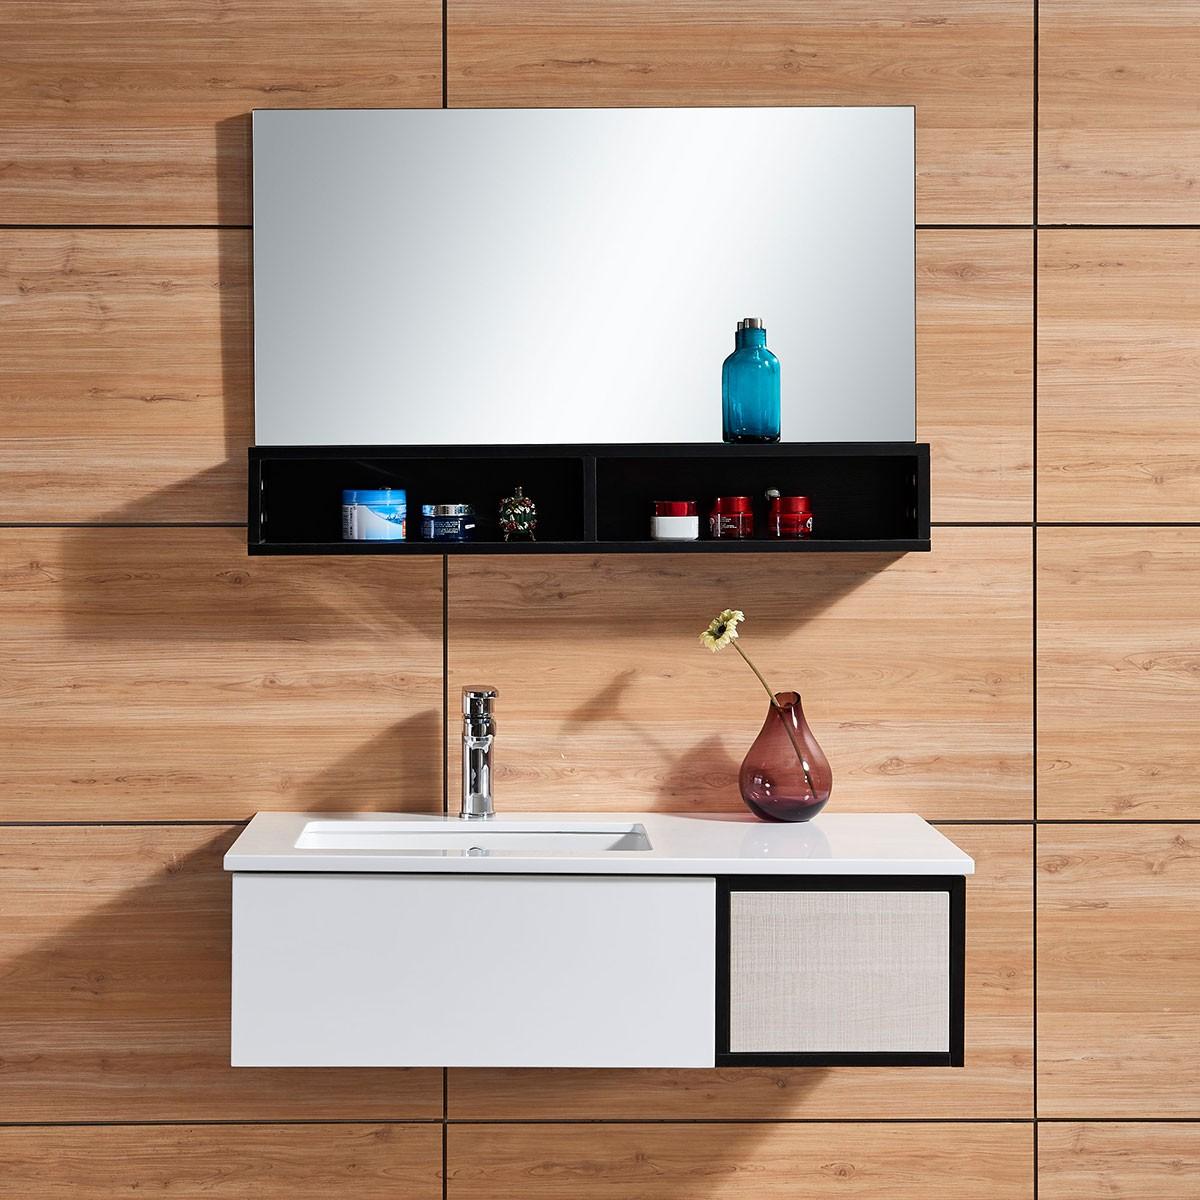 39 po meuble salle de bain suspendu au mur avec miroir dk for Meuble mural avec miroir